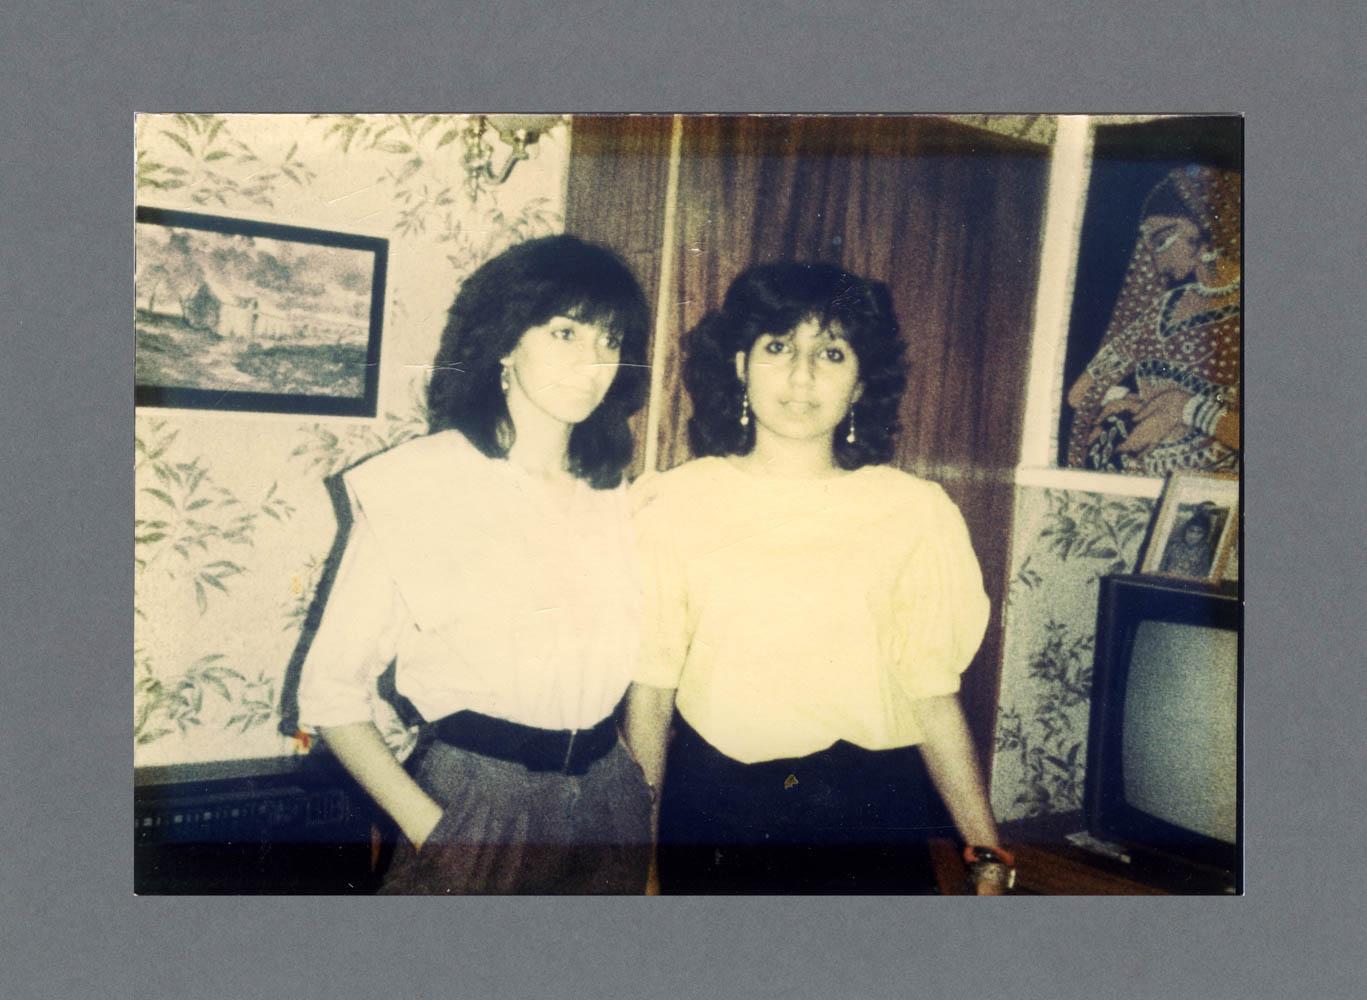 Woodcote Rd c.1987